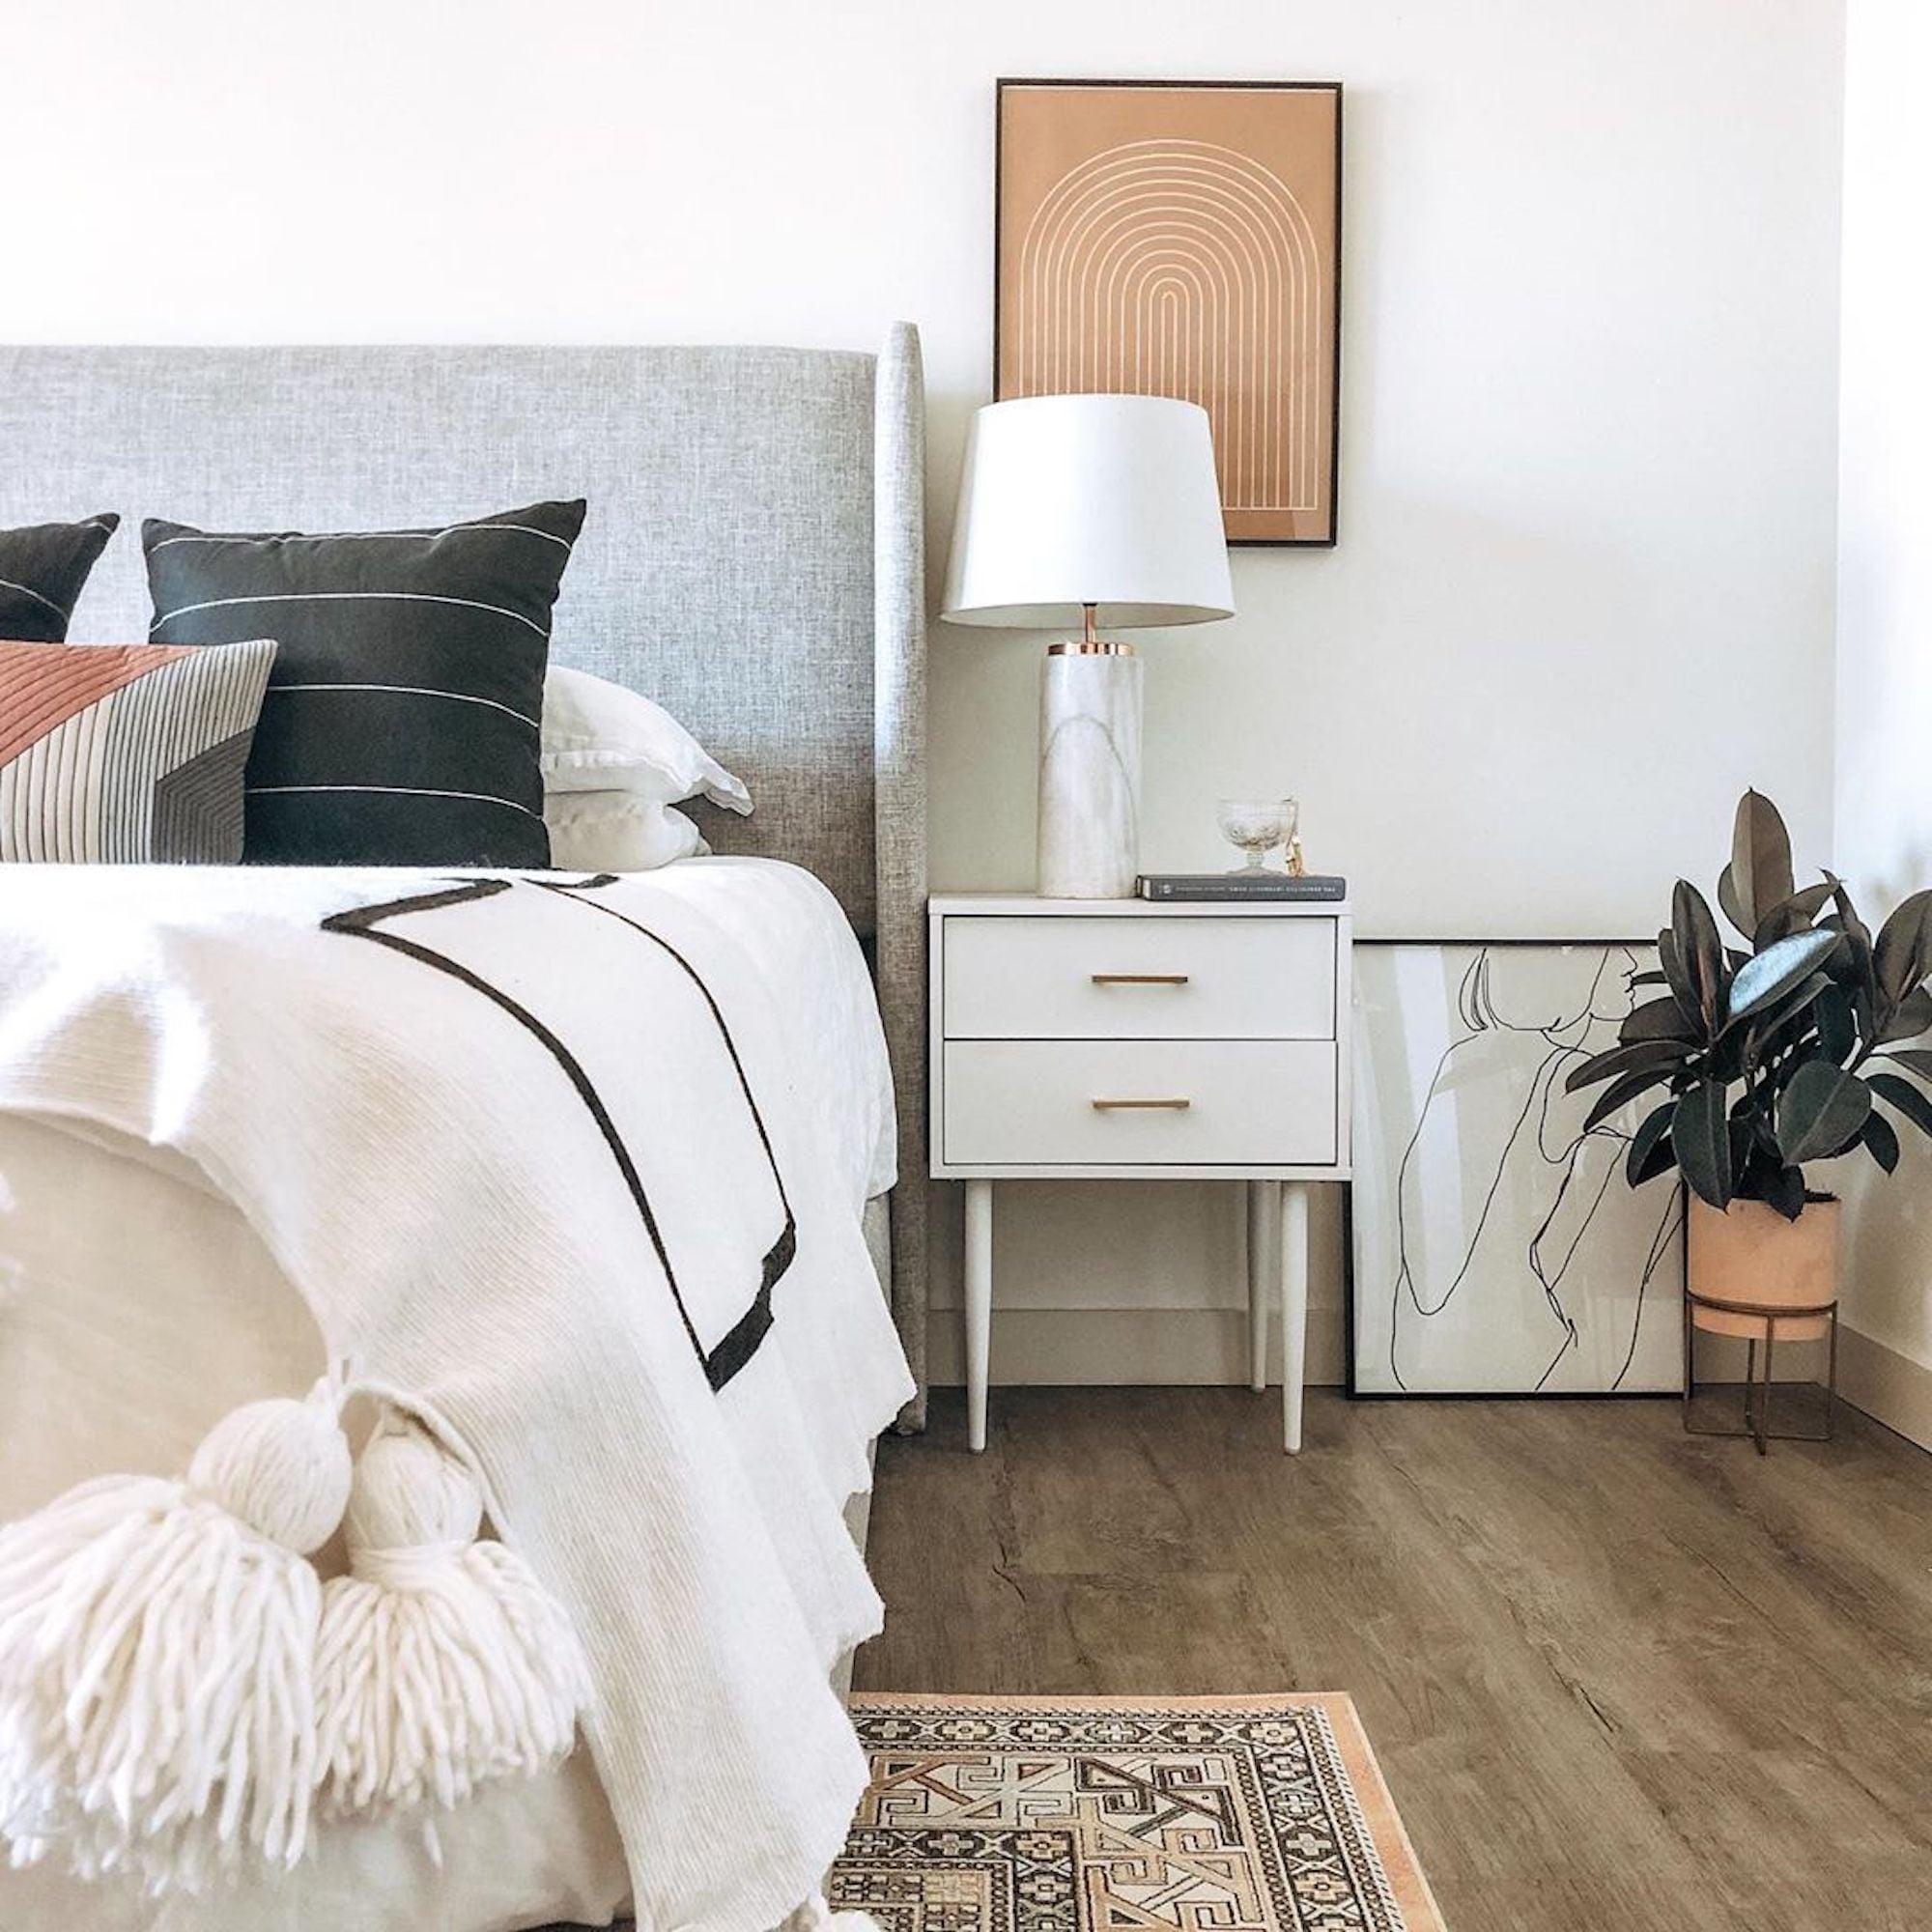 Modern Bedroom Design Ideas | POPSUGAR Home